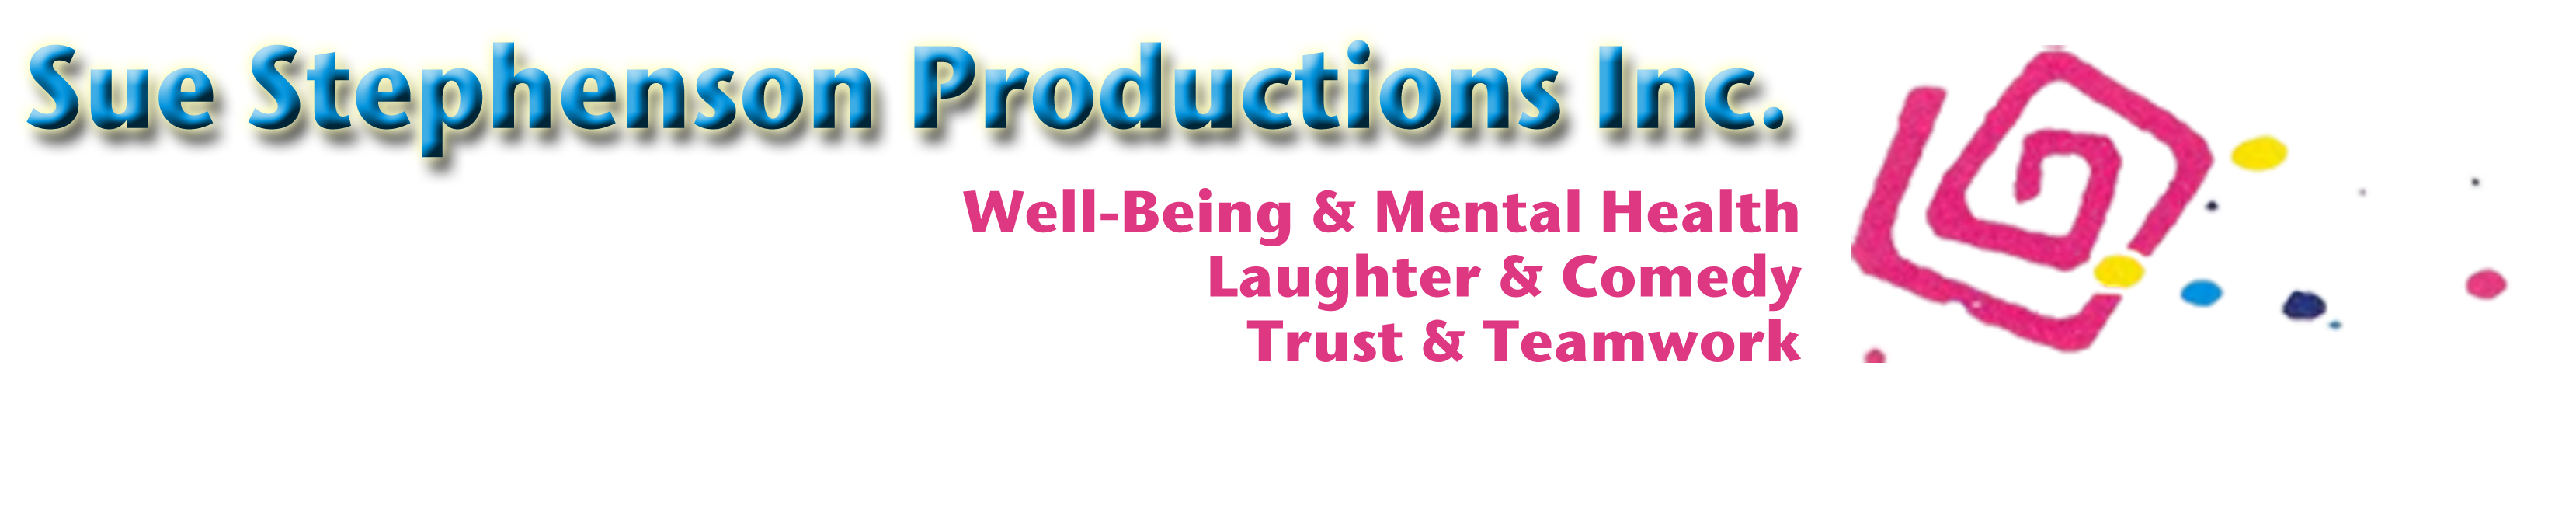 Sue Stephenson Productions